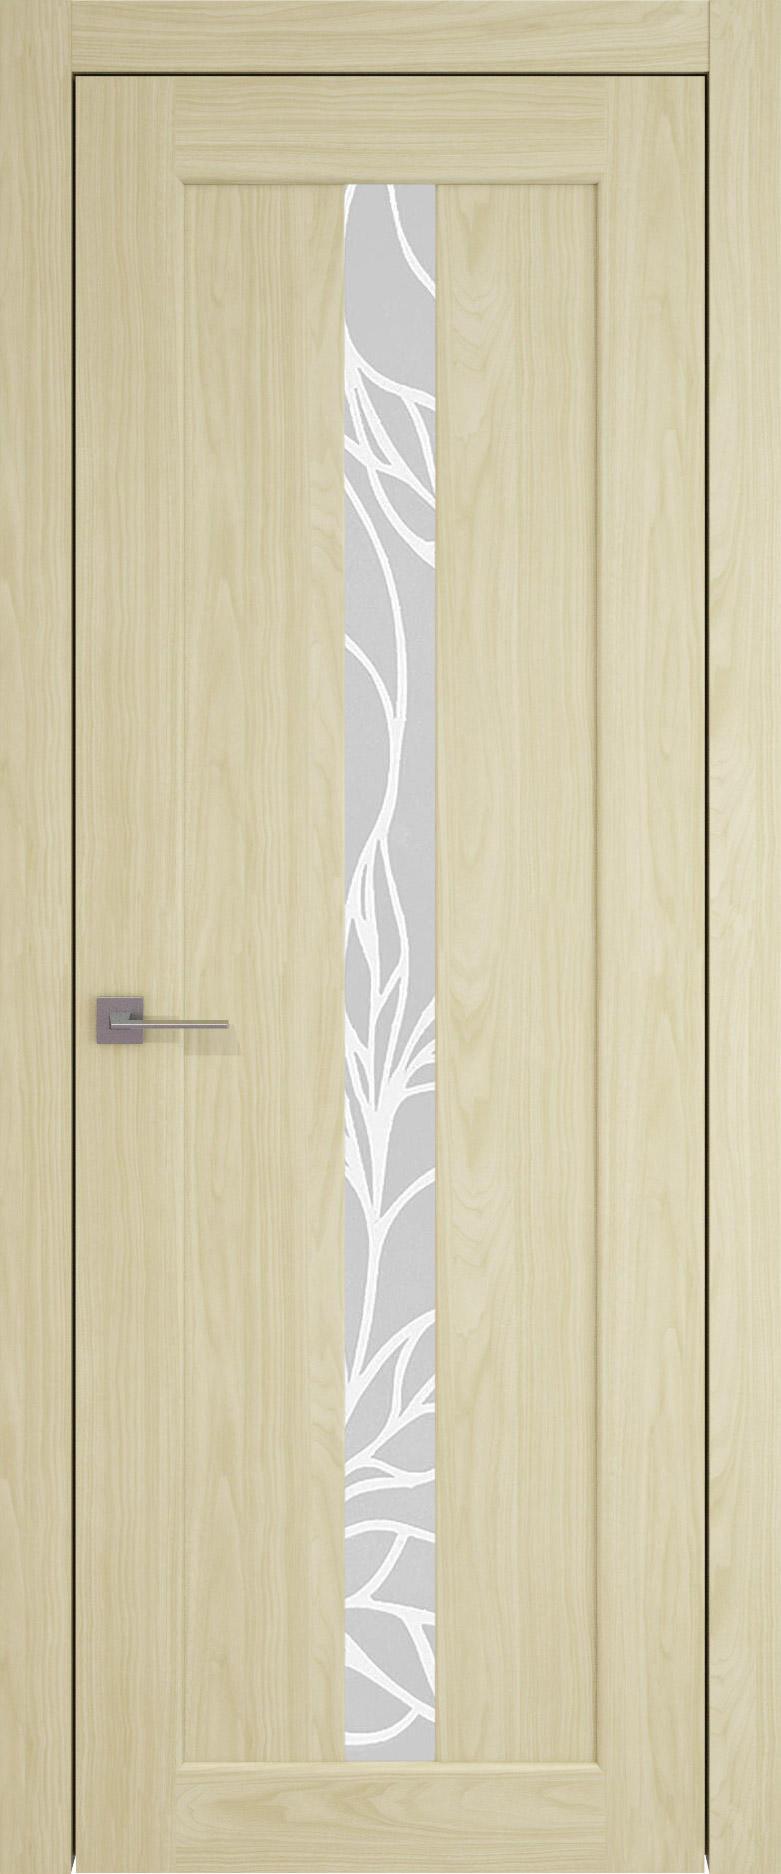 Pianta цвет - Дуб нордик Без стекла (ДГ)